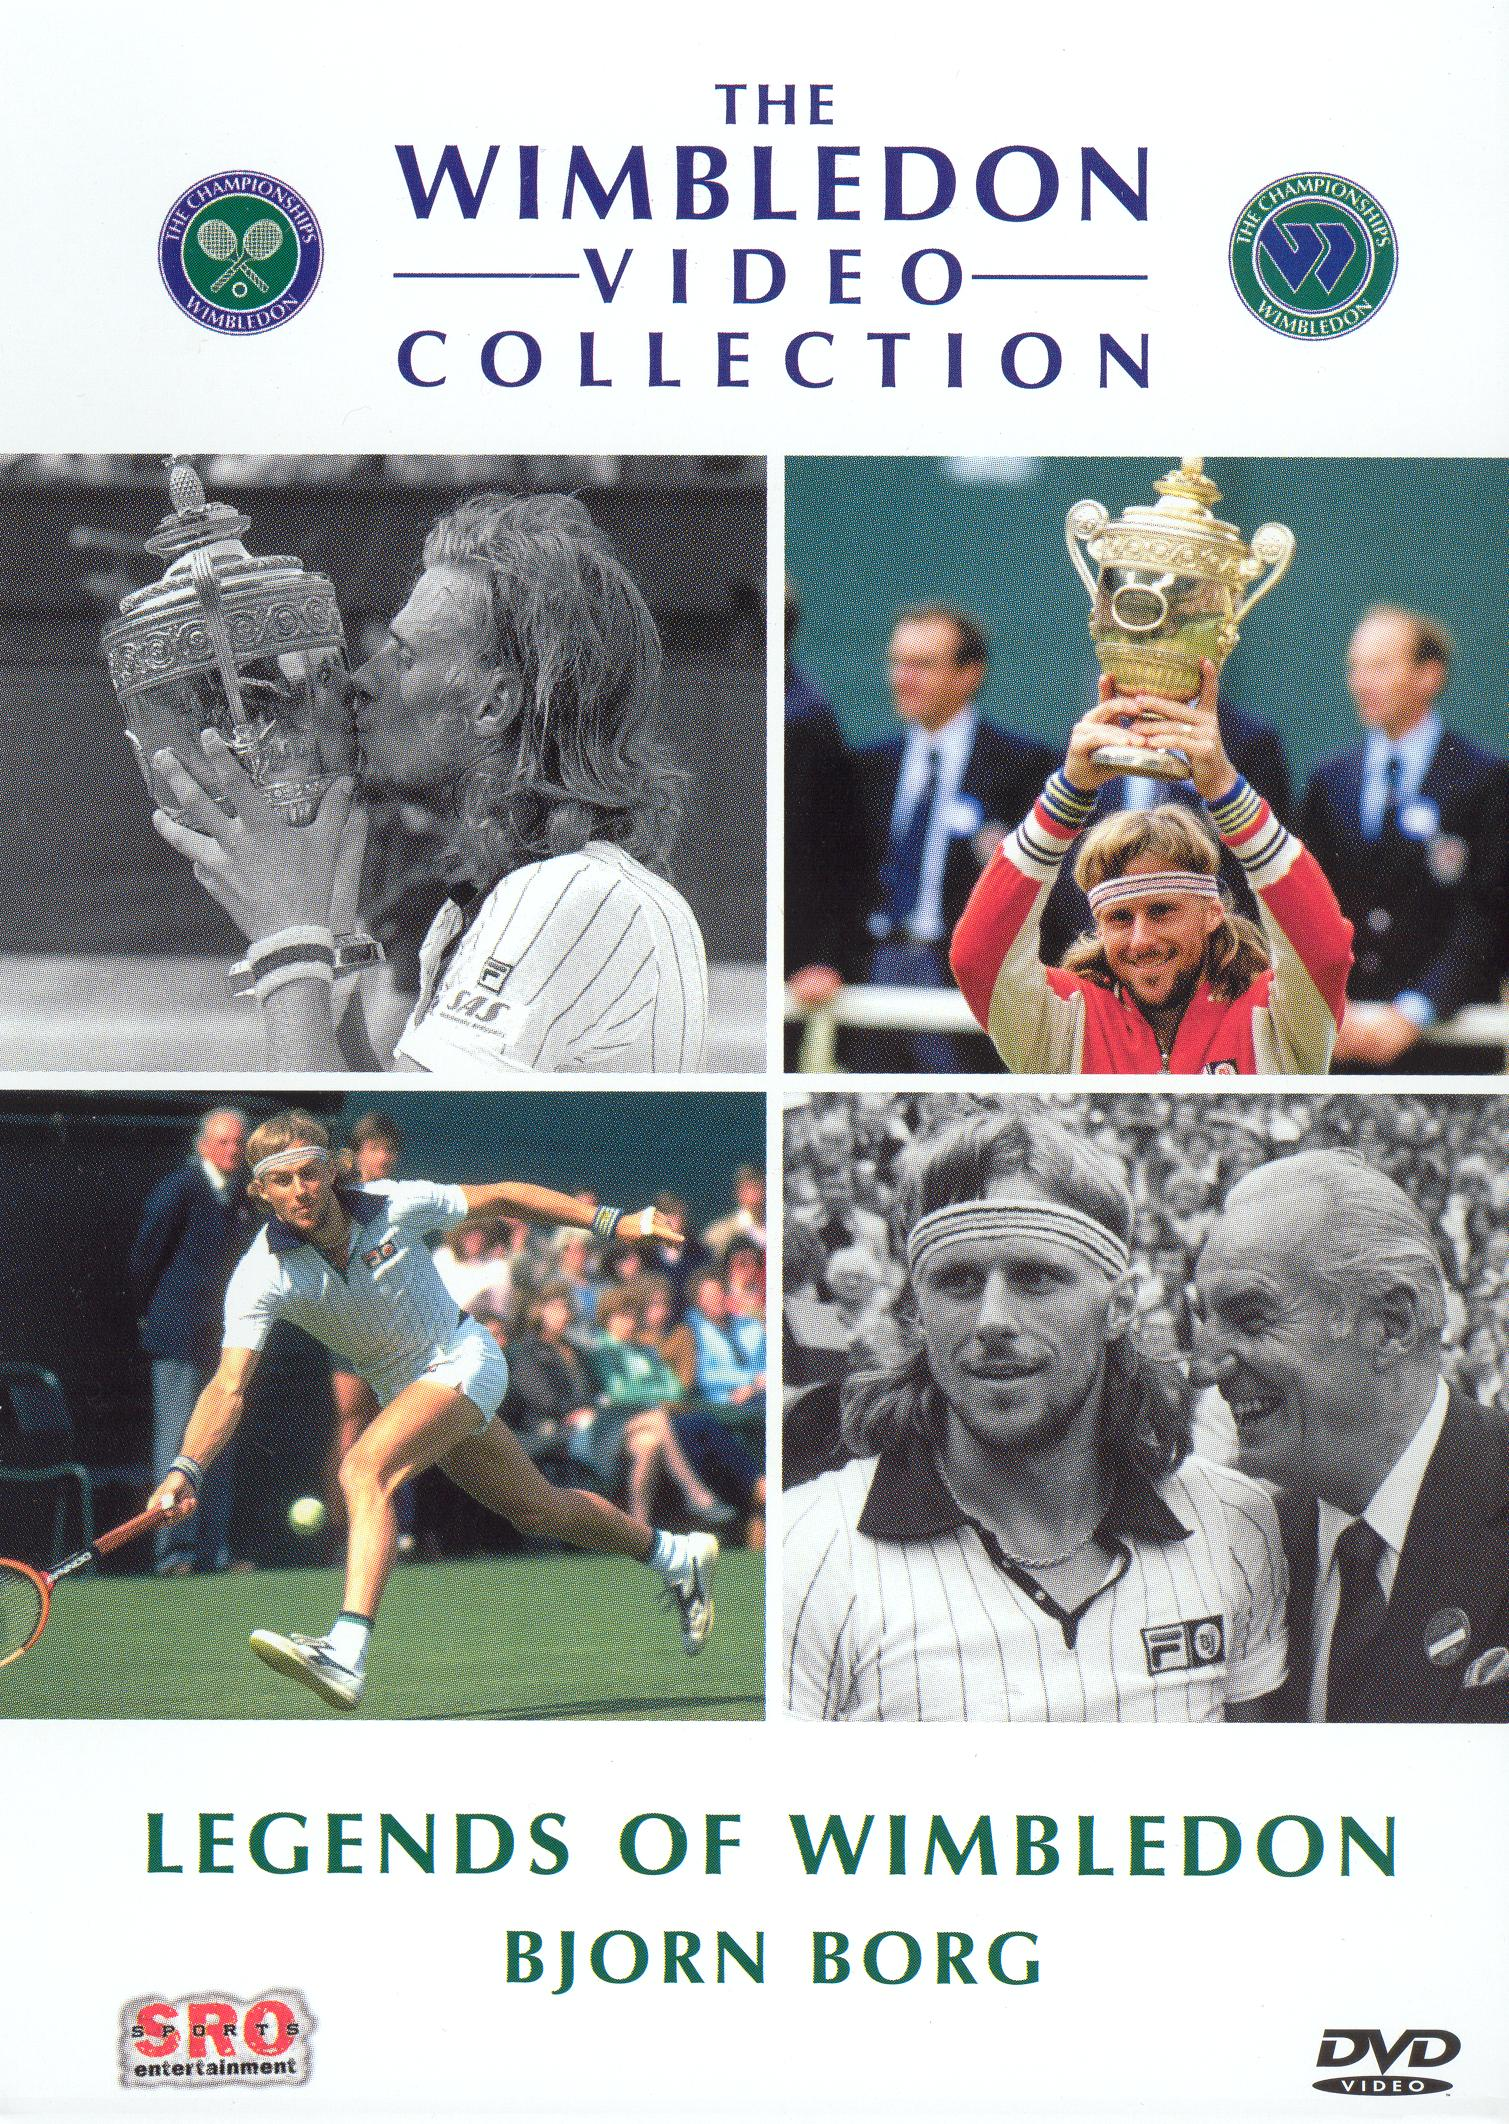 Legends of Wimbledon: Bjorn Borg